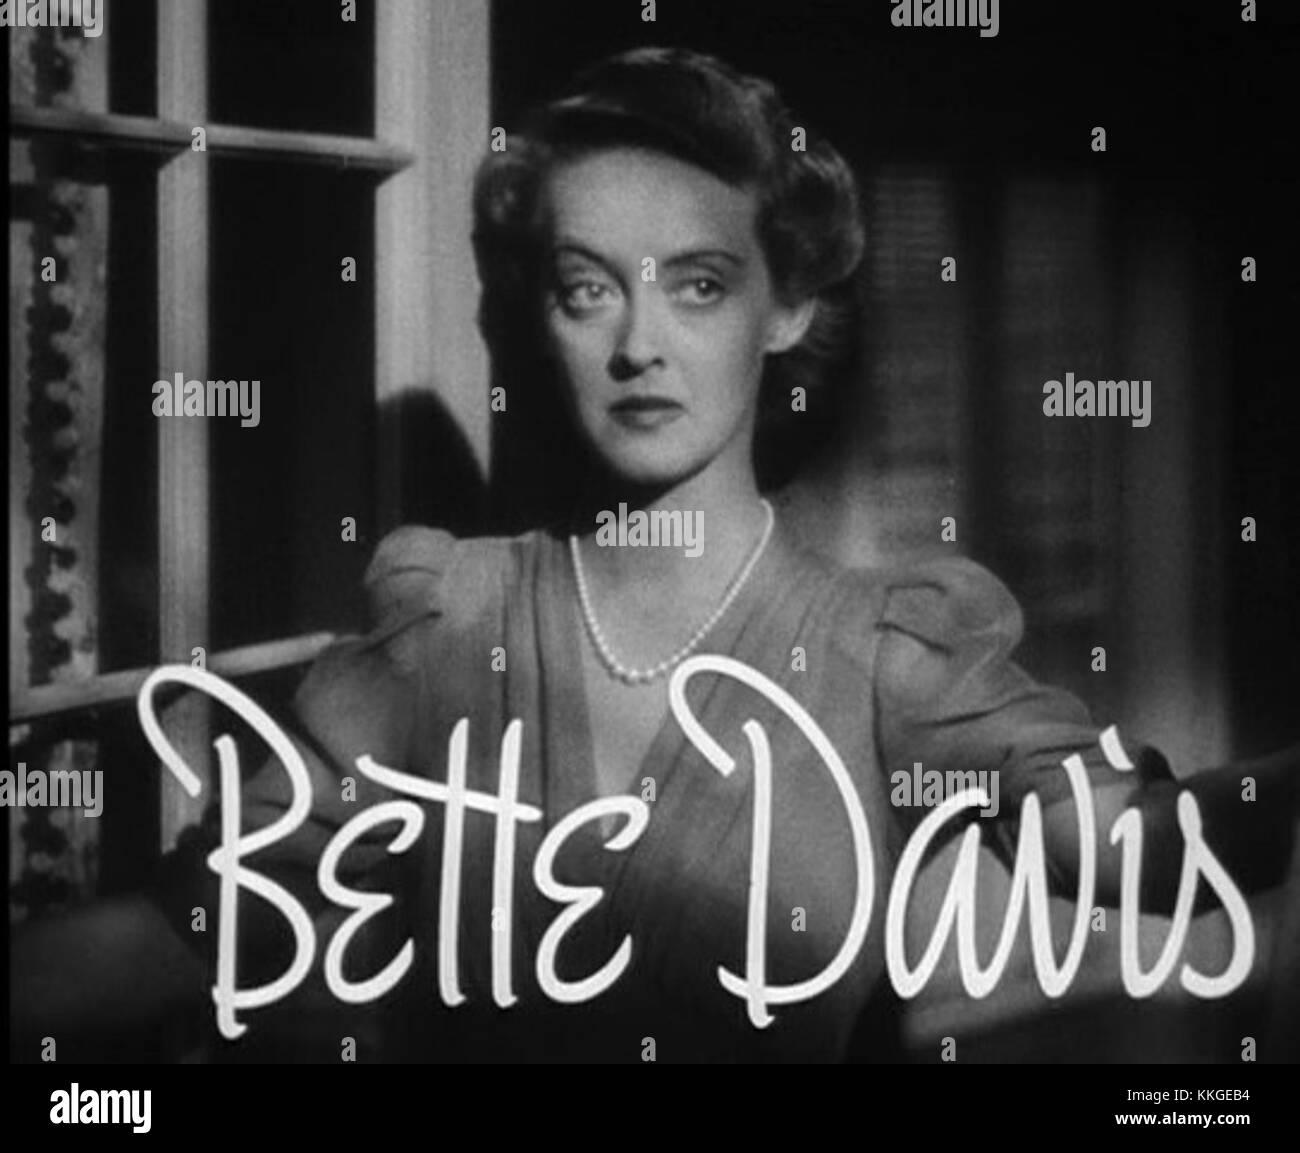 Bette Davis in The Letter trailer 1 Stock Photo: 166934296   Alamy